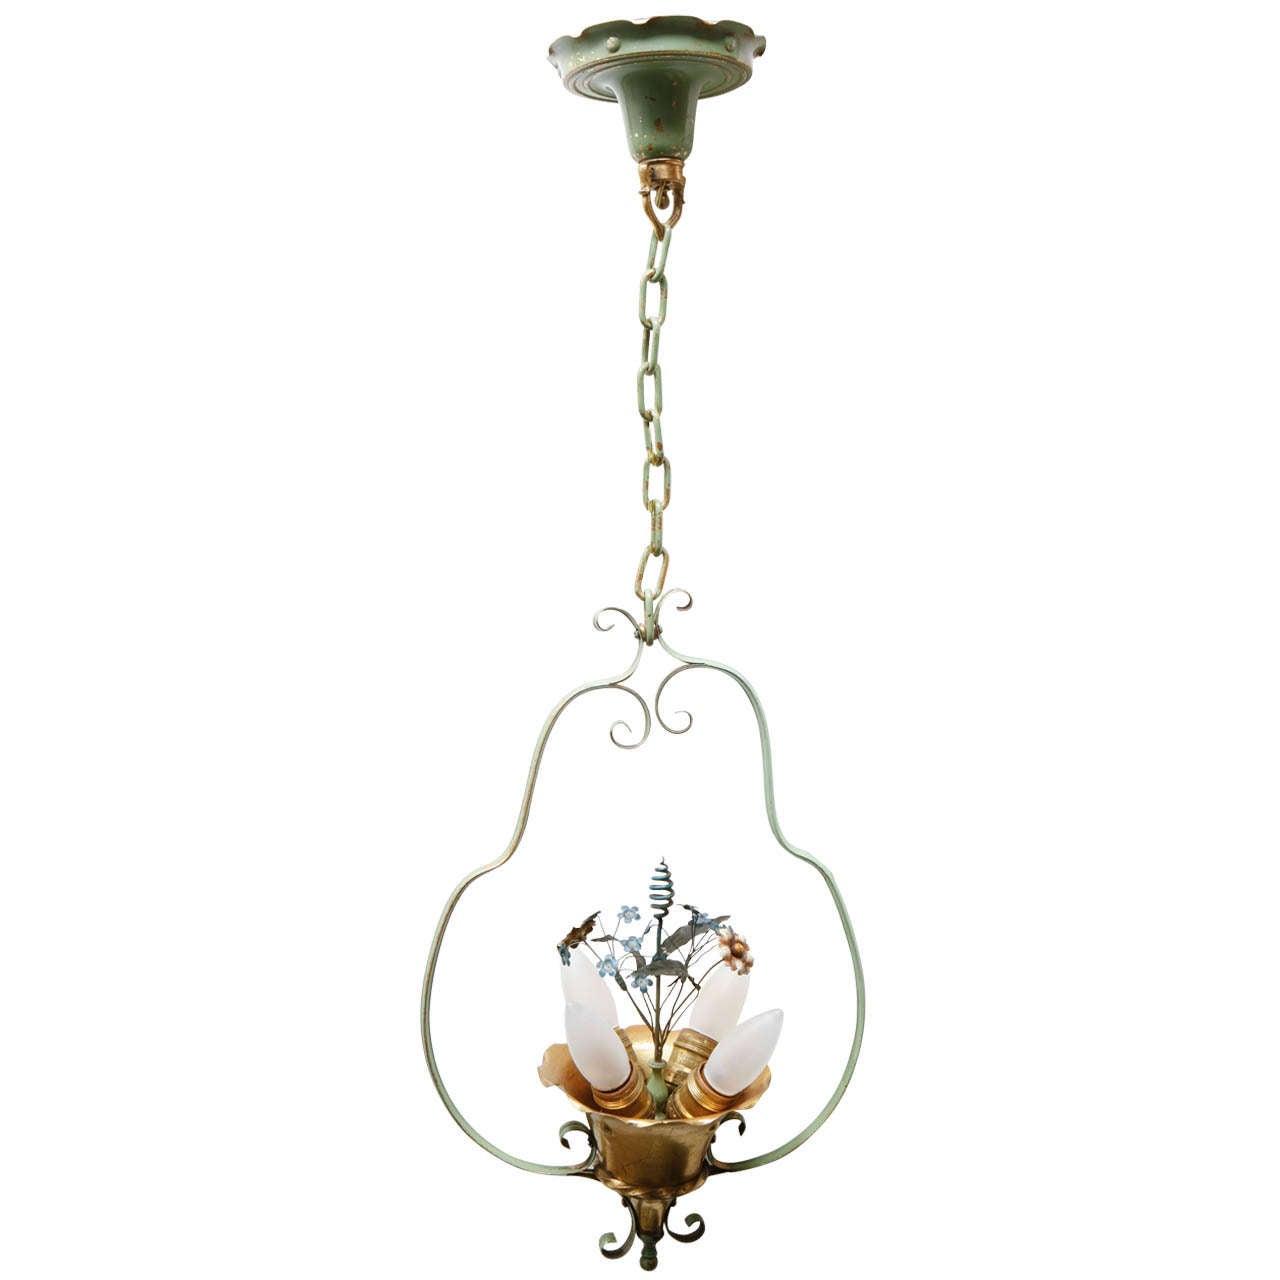 French Mid Century Flower Basket Hanging Light At 1stdibs